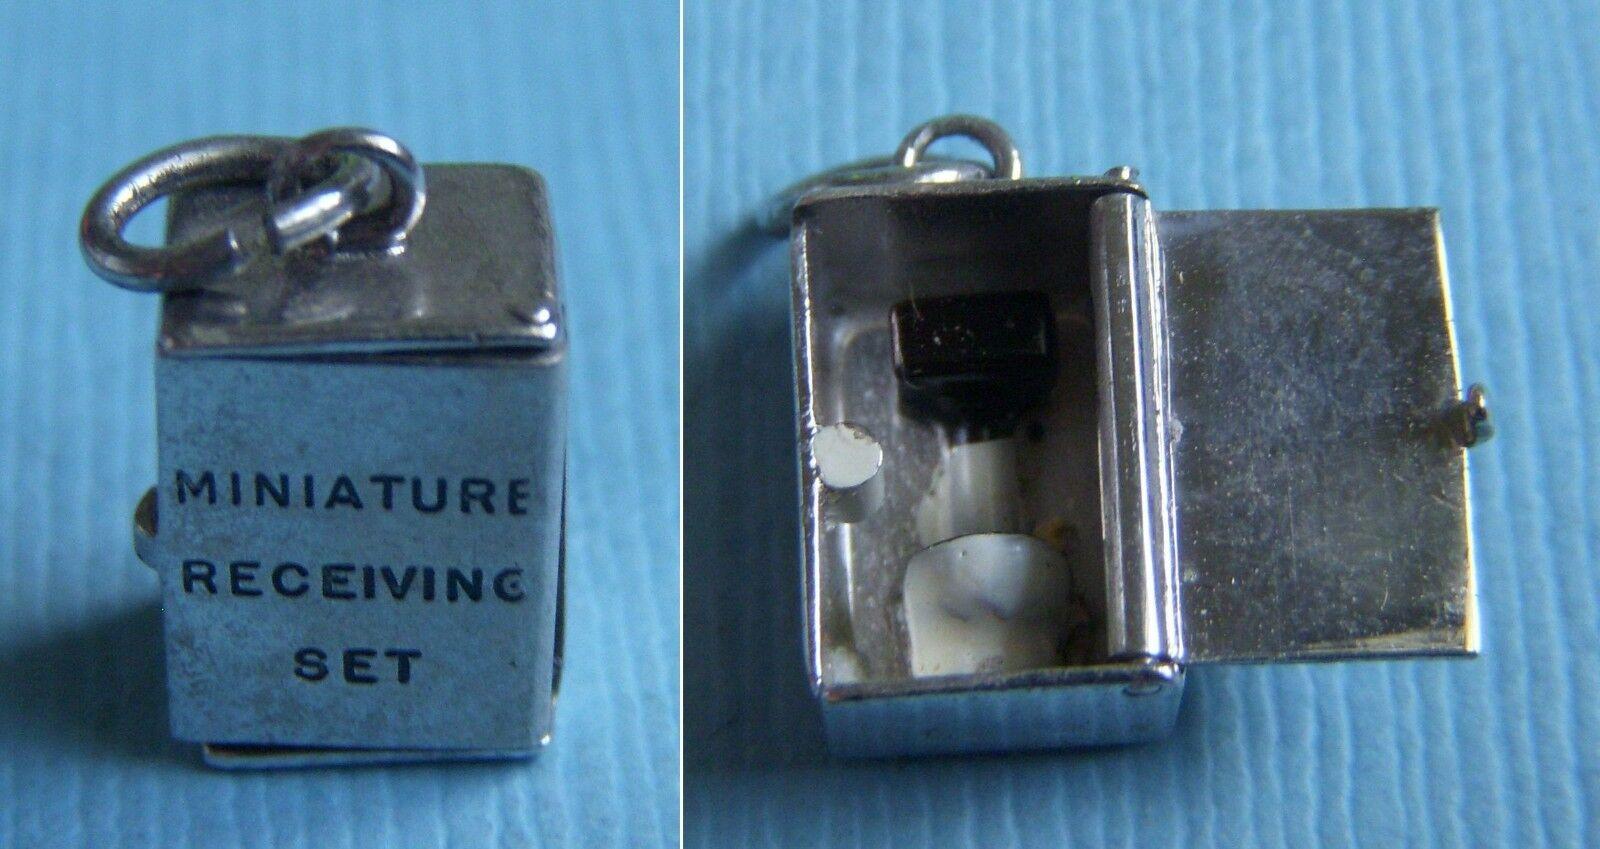 Vintage movable enamel Miniature Receiving Set toilet punny sterling charm